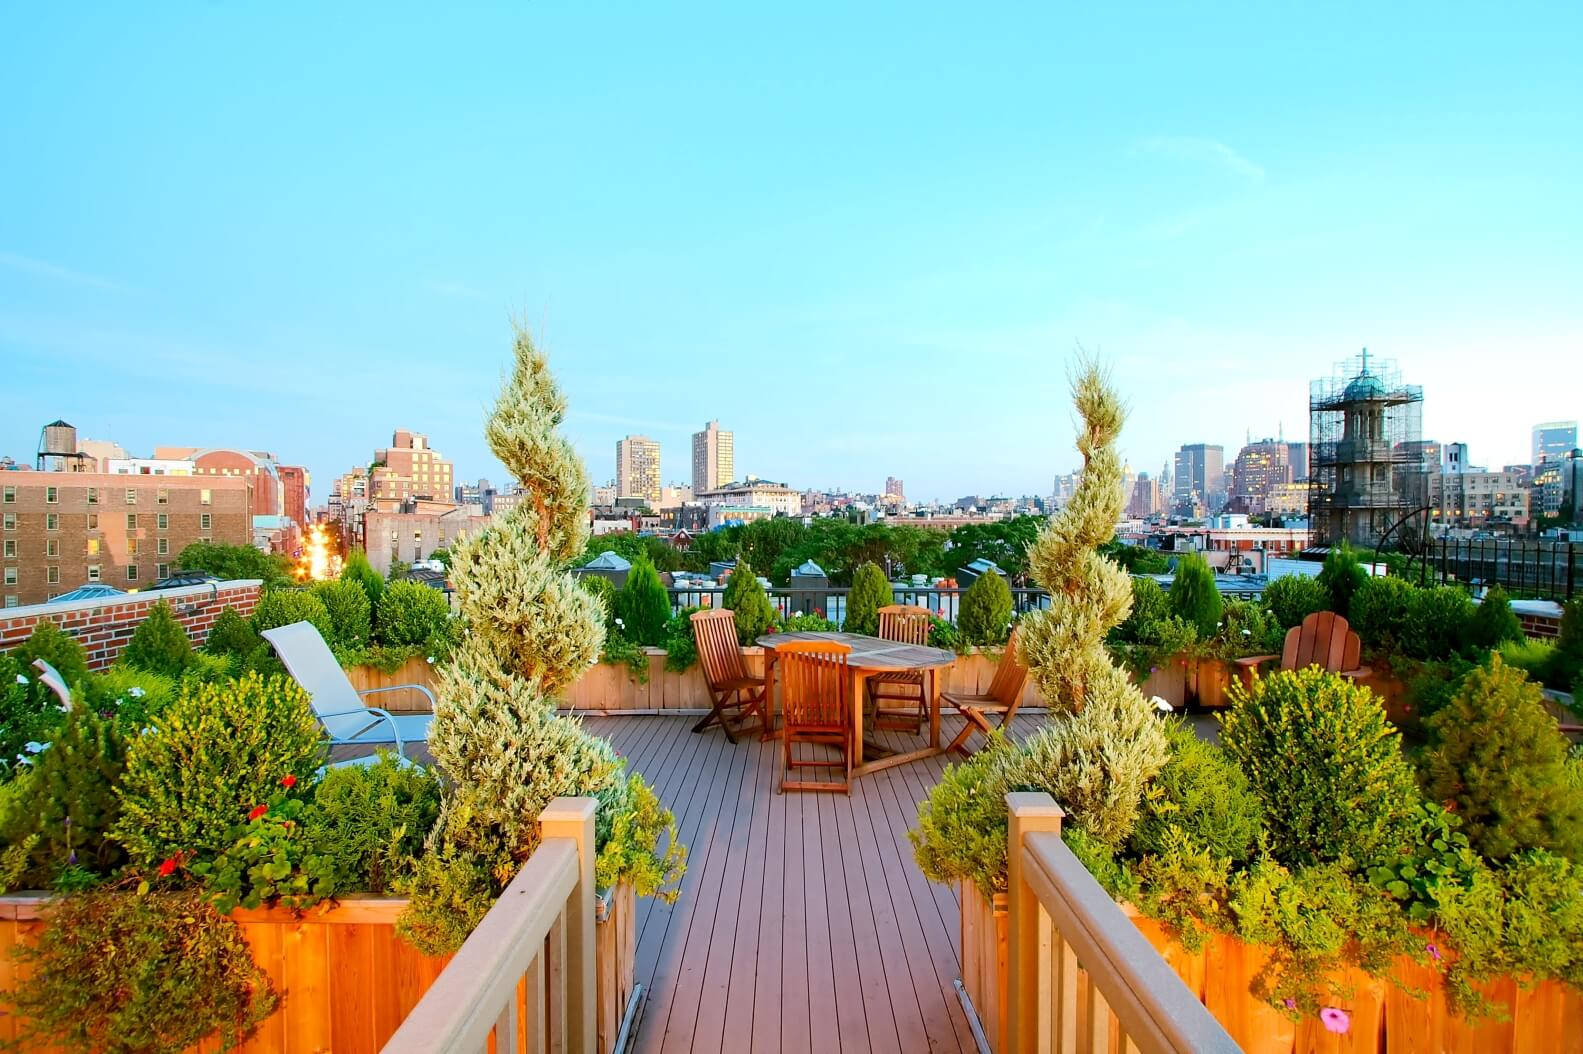 Brooklyn Rooftop Garden & Pergola